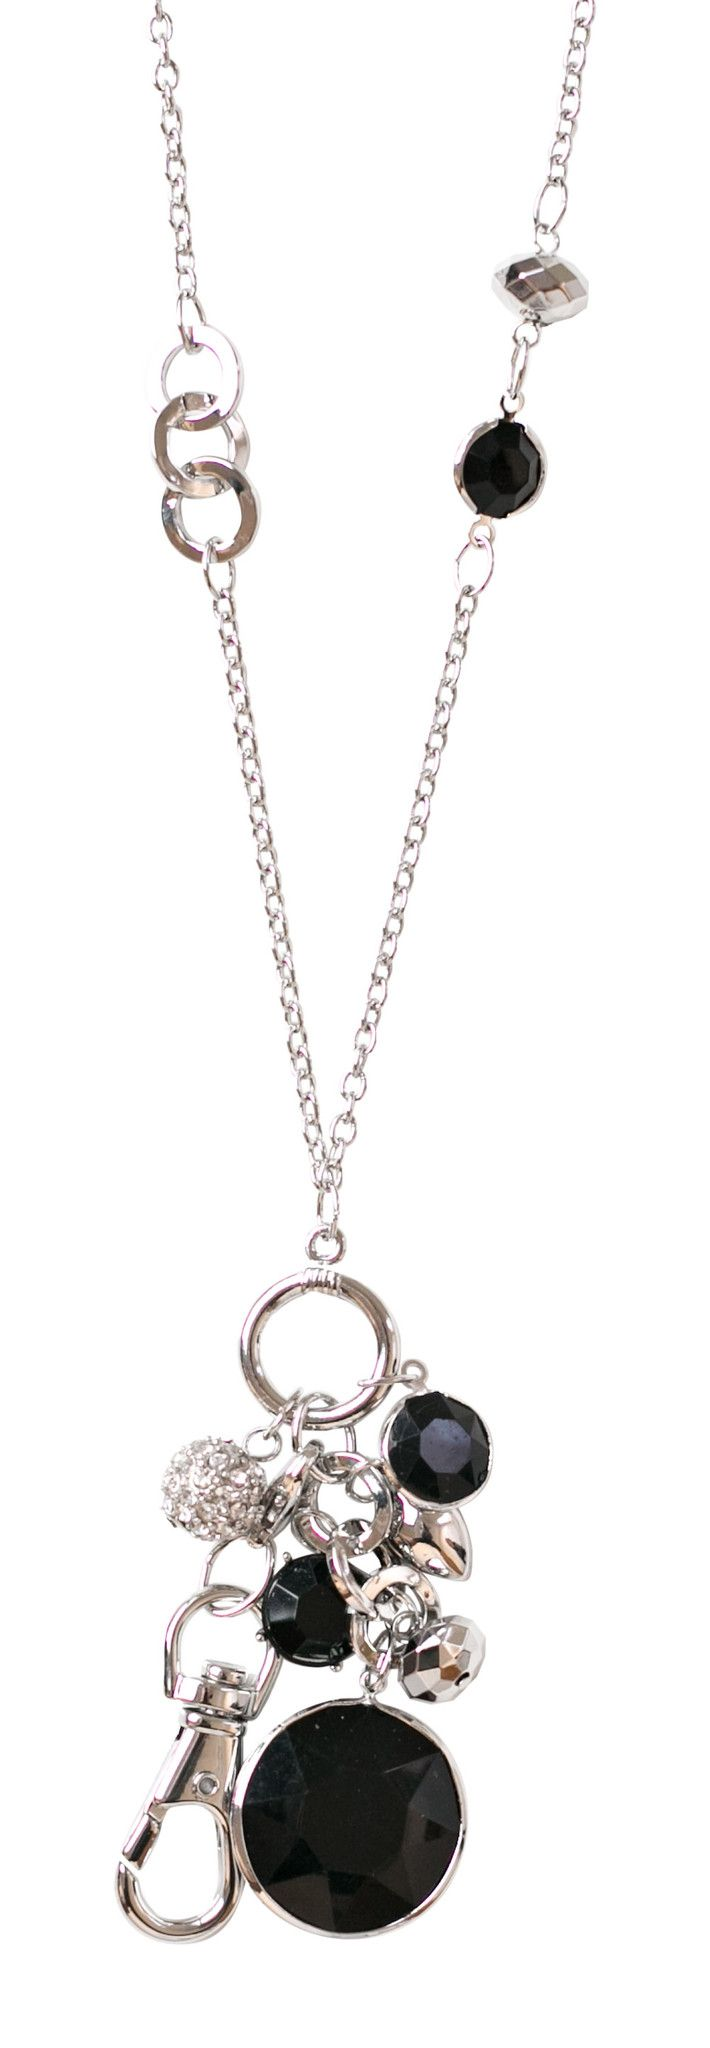 Emily Jet Convertible Drop Pendant Lanyard Necklace (Silver)